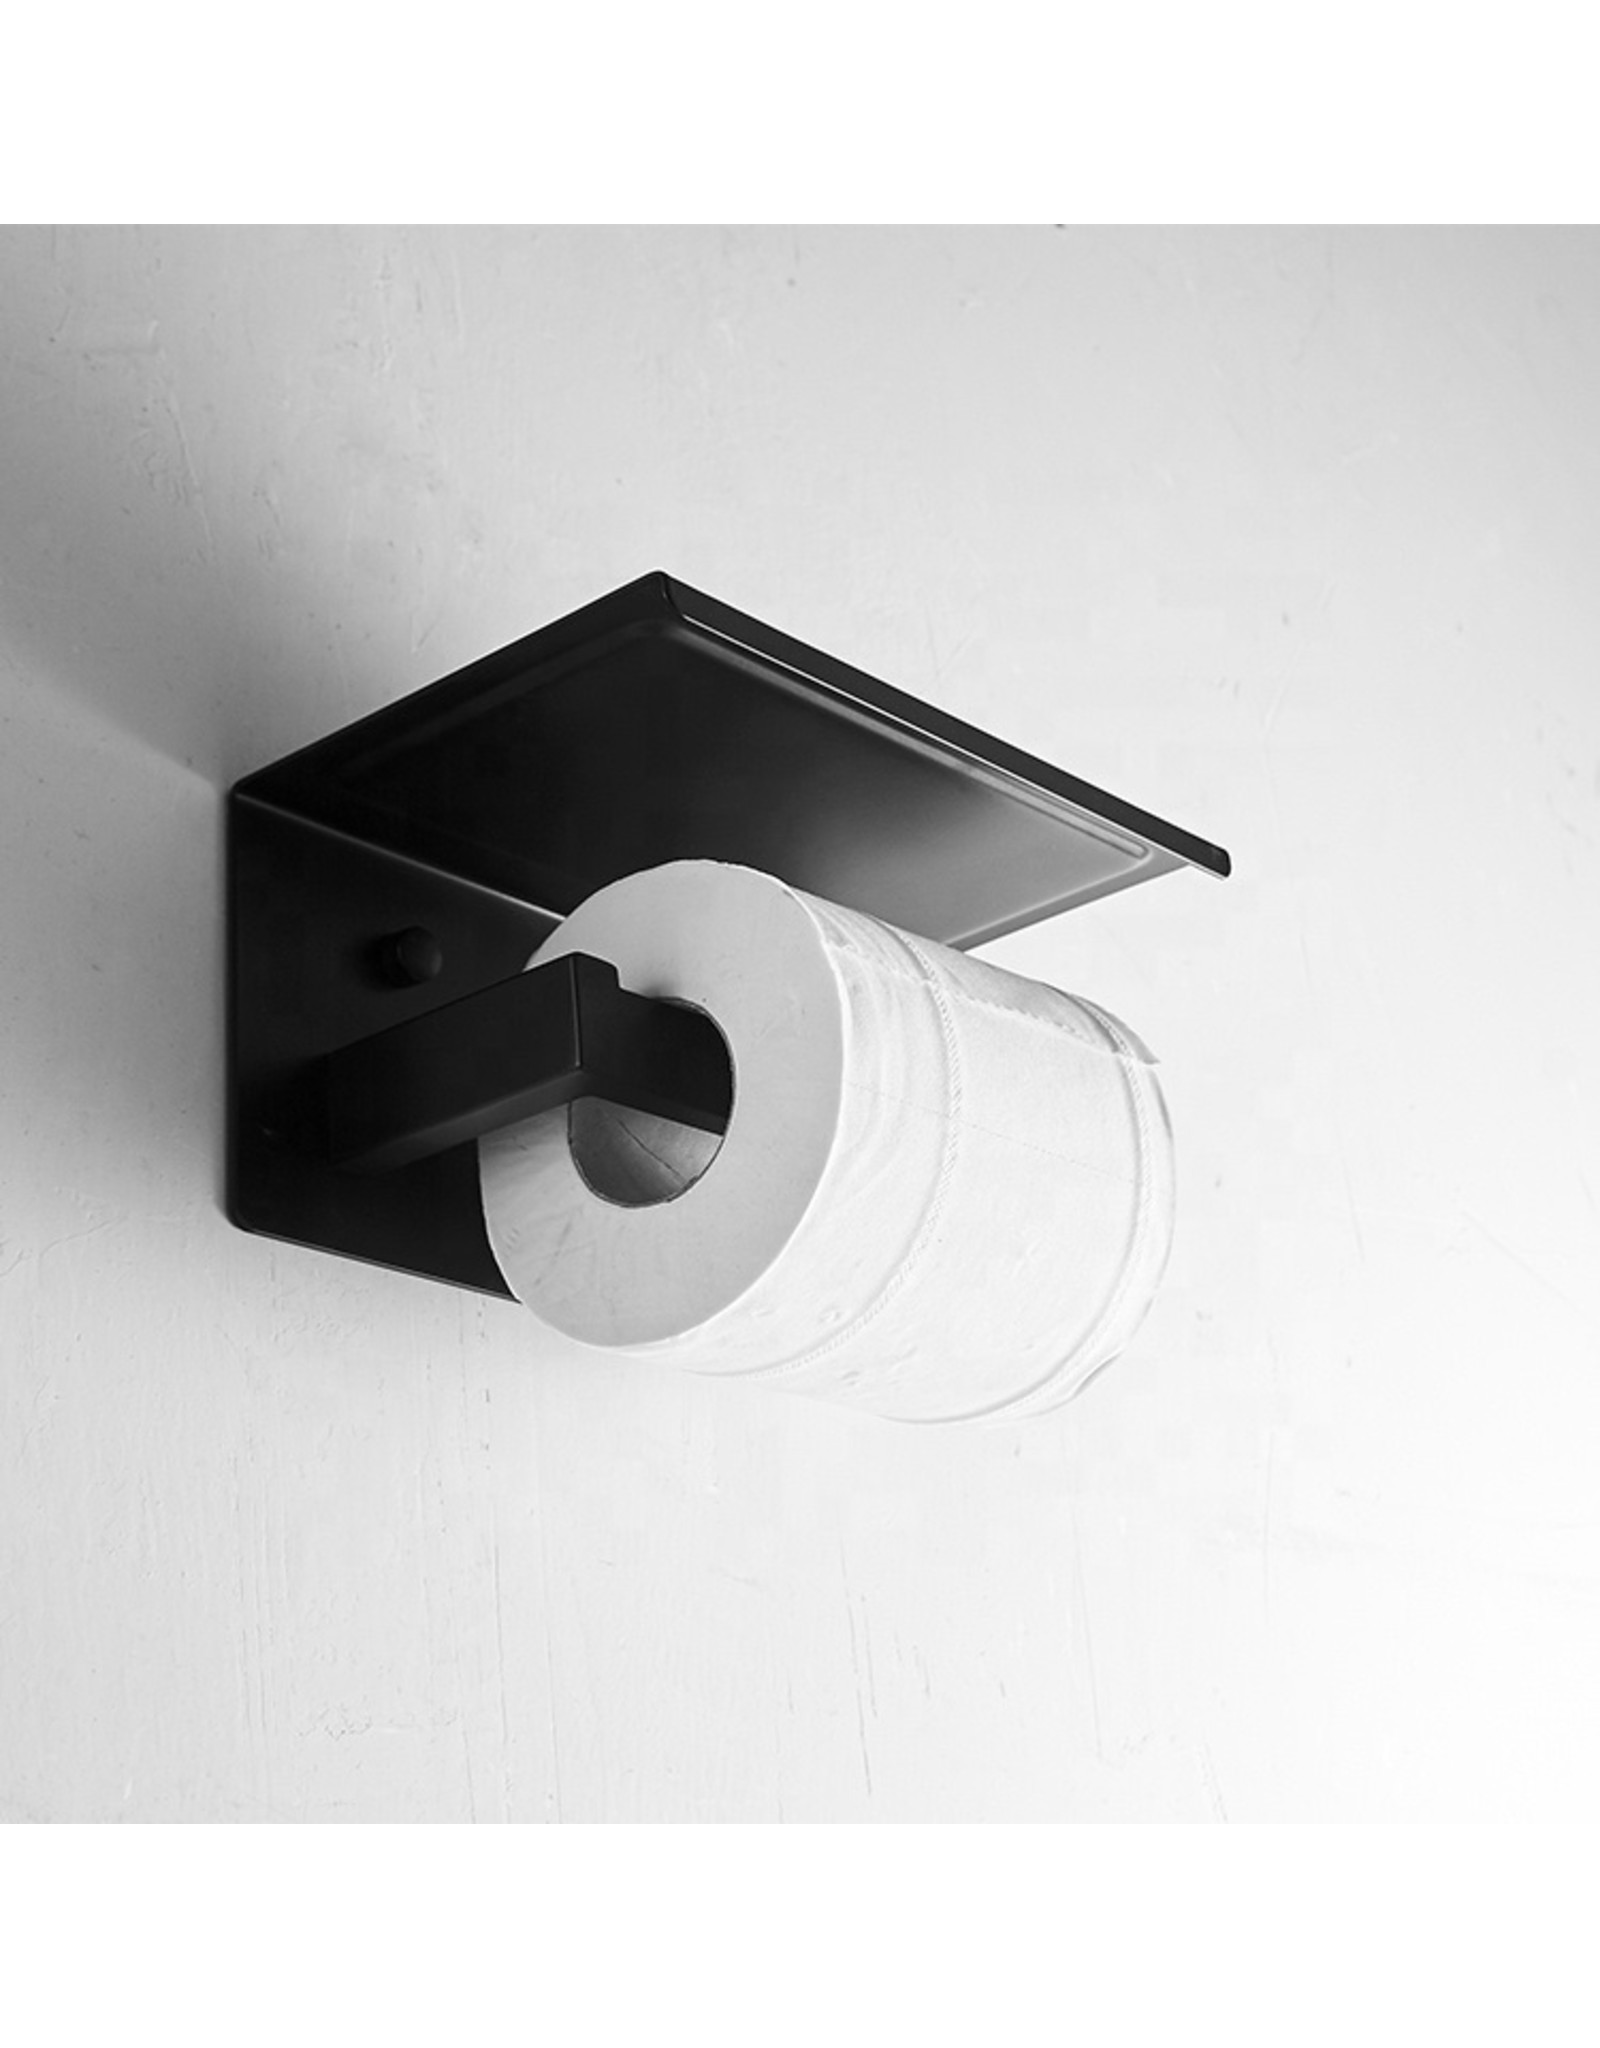 Parya Home Parya Home - Toilet roll holder - With Phone holder - Black